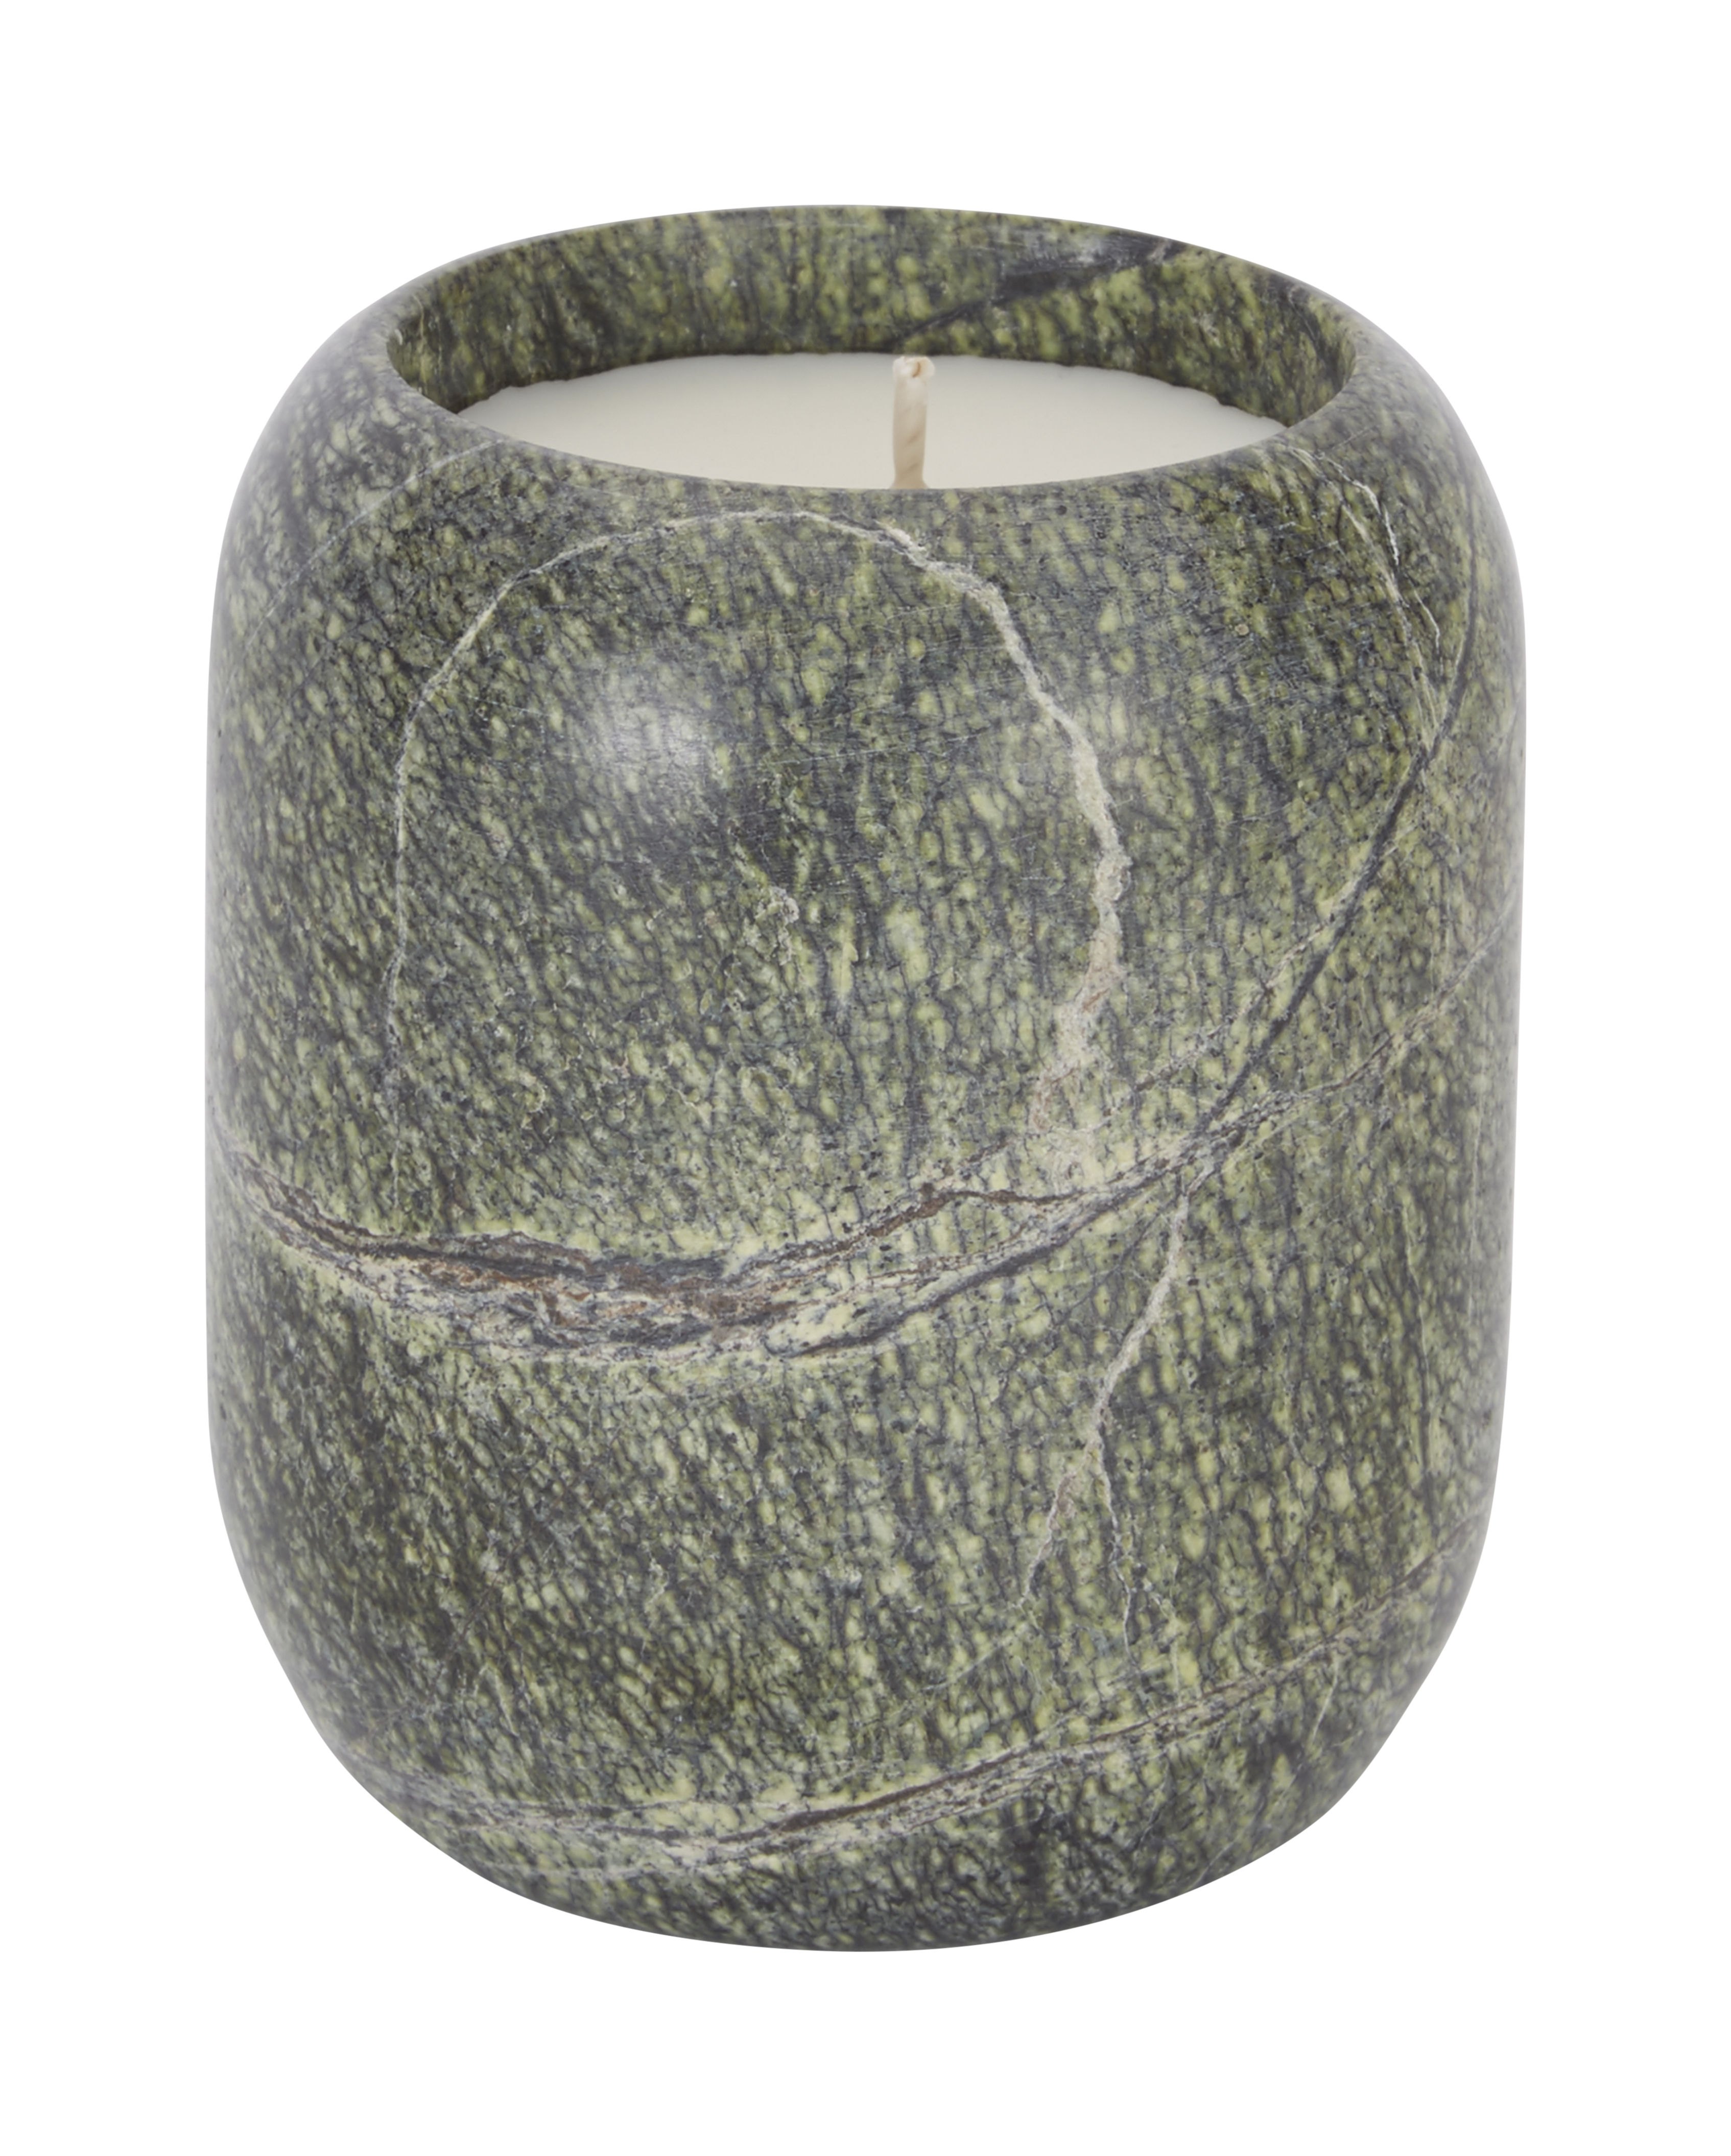 stone medium marmor h 10 cm tom dixon parfumierte. Black Bedroom Furniture Sets. Home Design Ideas